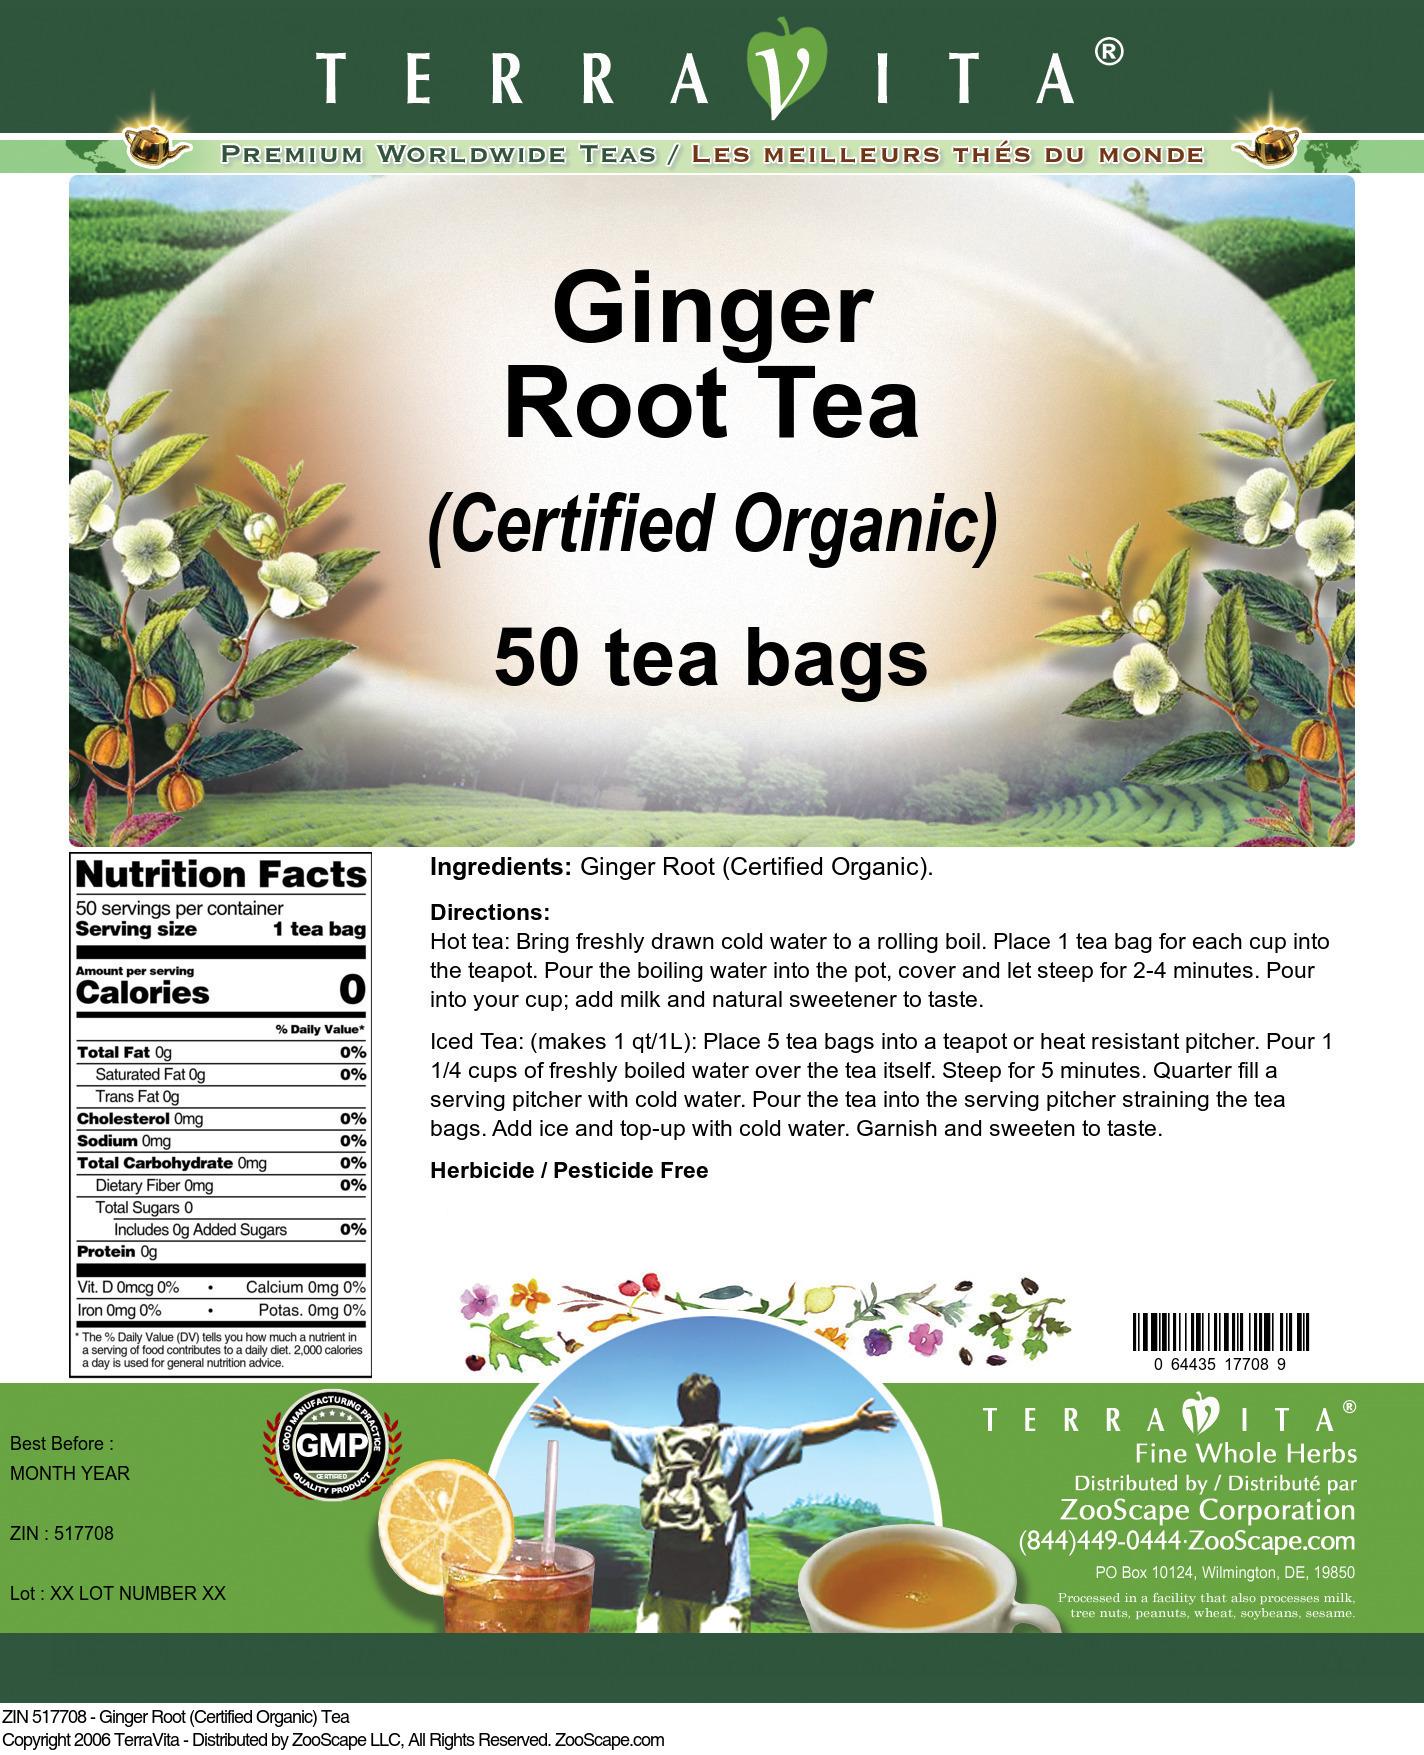 Ginger Root (Certified Organic) Tea